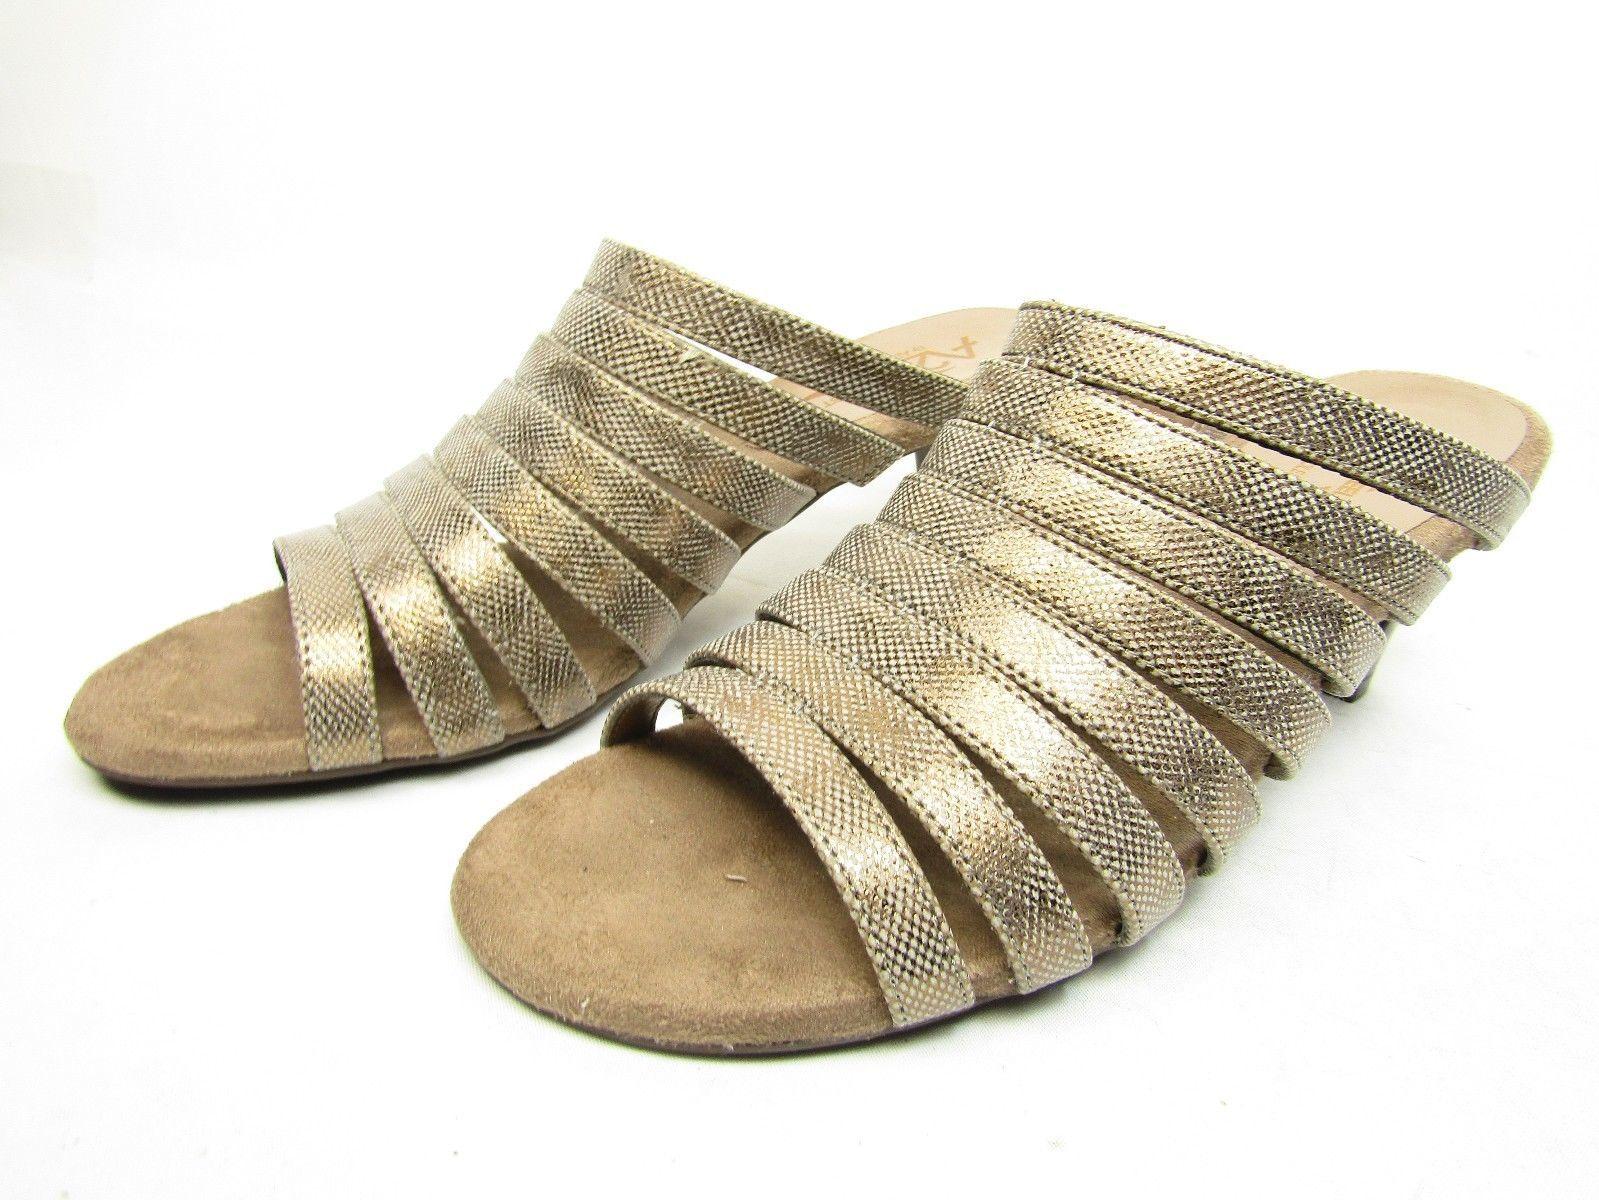 5532cfec20b5 A2 by Aerosoles Spowse Women s Dress Sandals and 50 similar items. 57